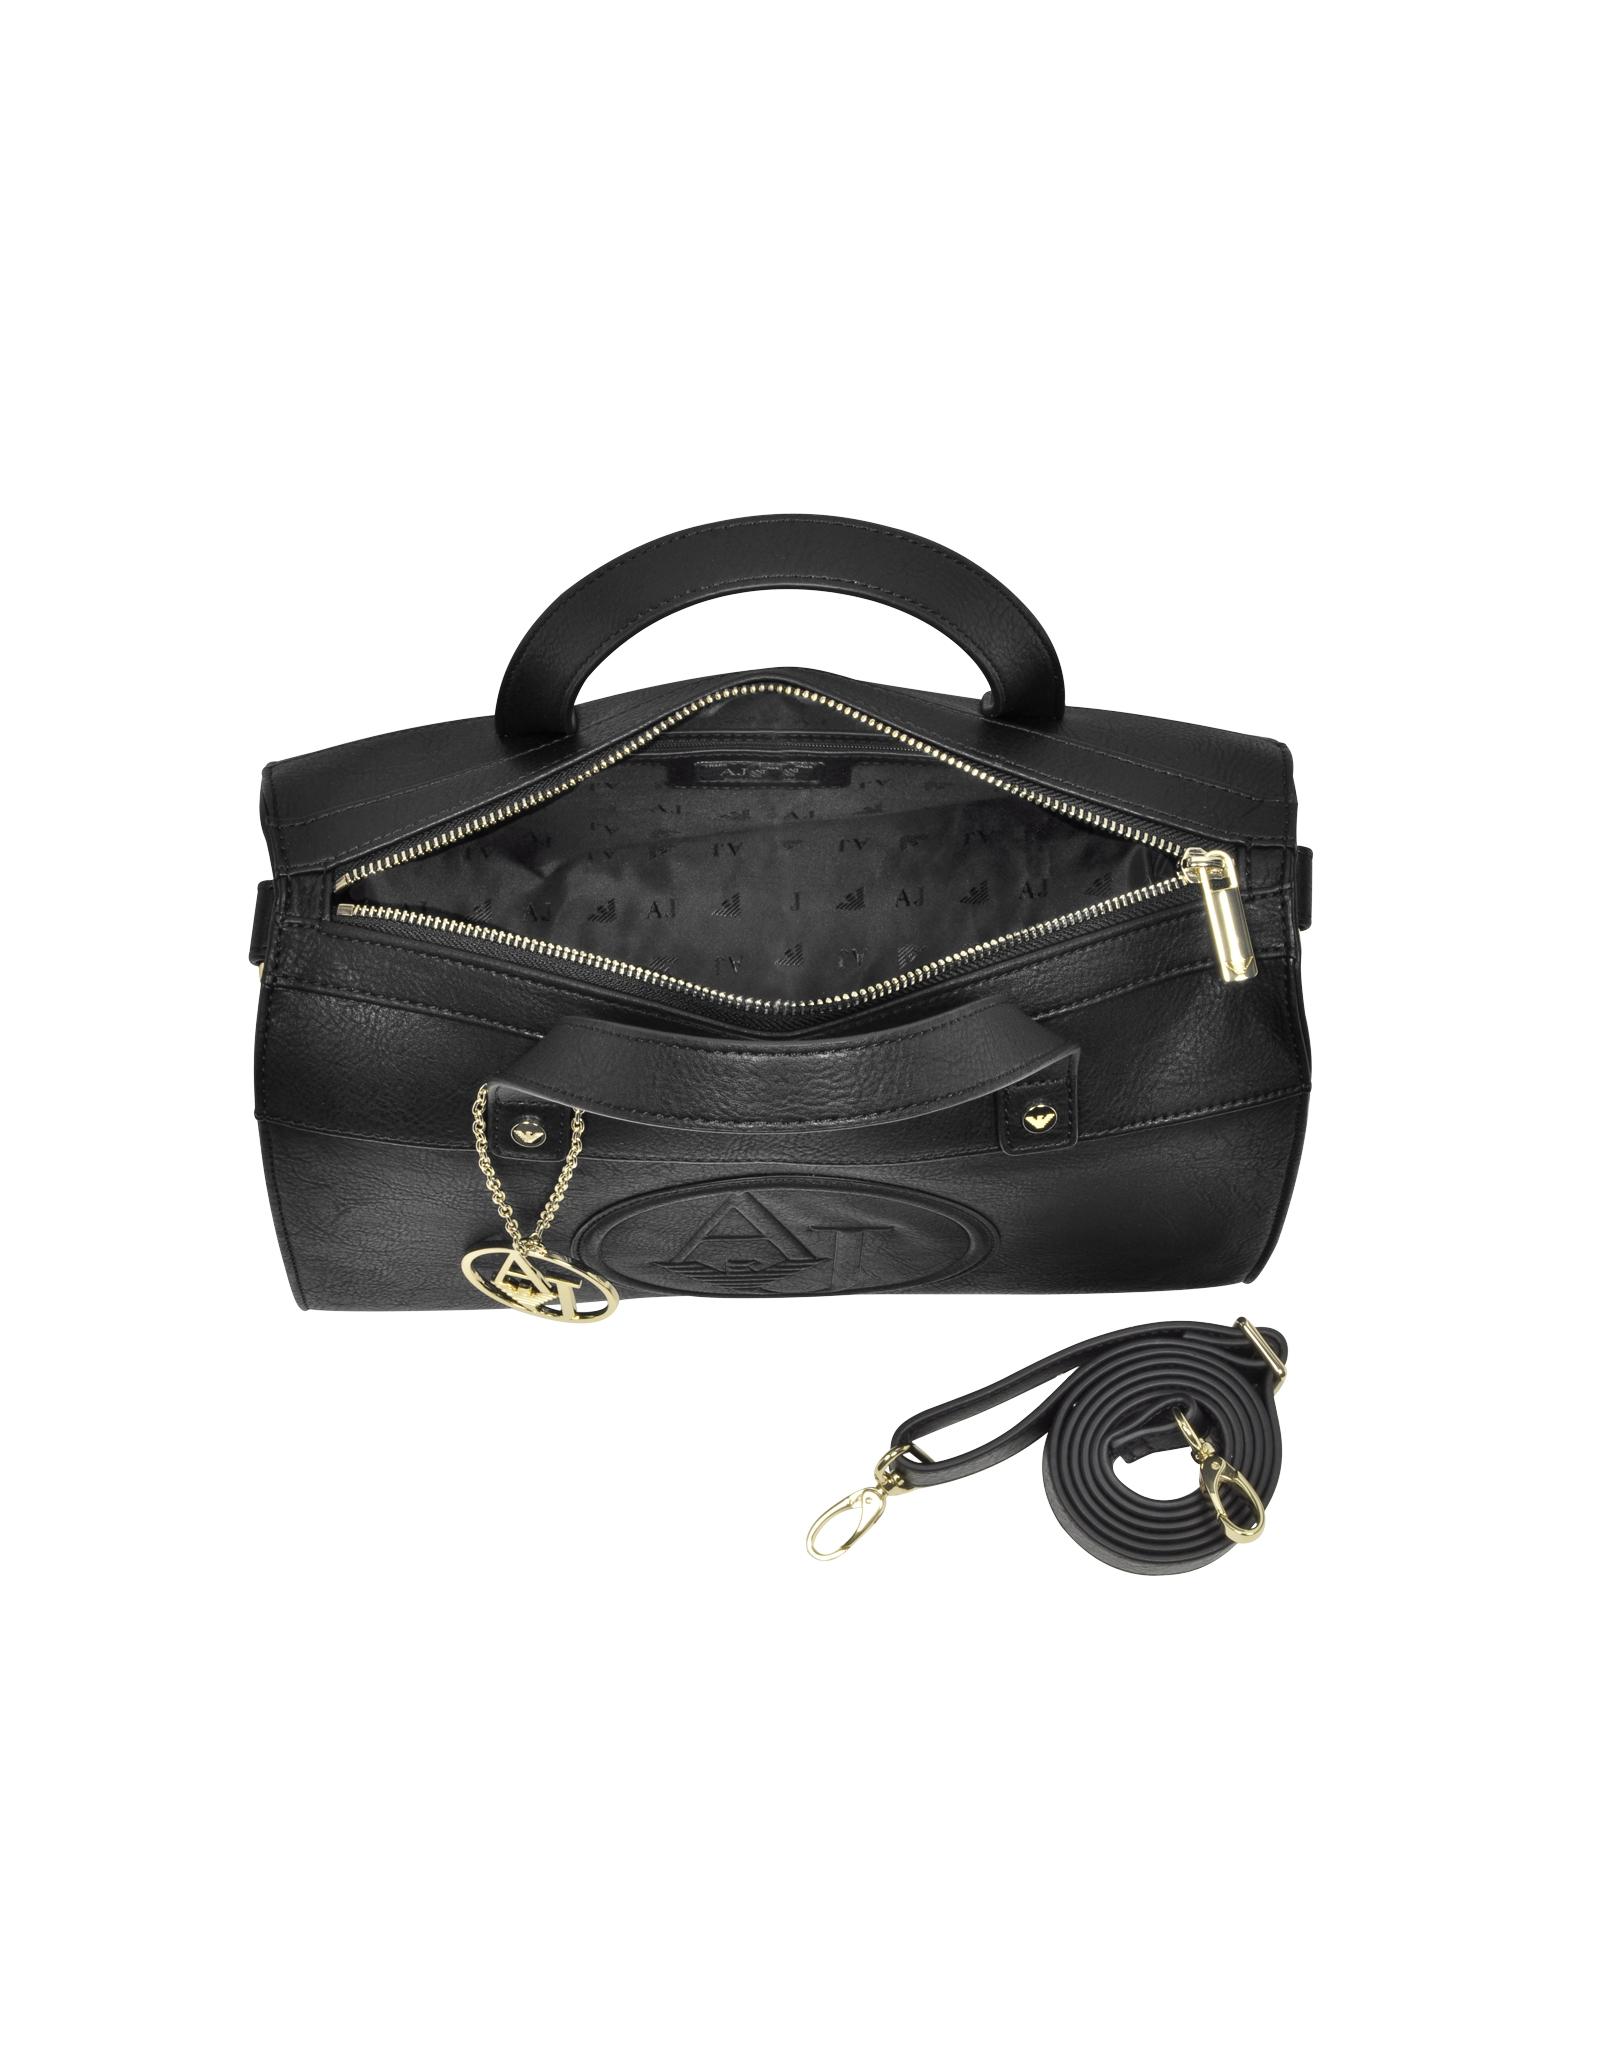 Lyst - Armani Jeans Black Eco Leather Bowling Bag in Black 4f69192b0e1ab